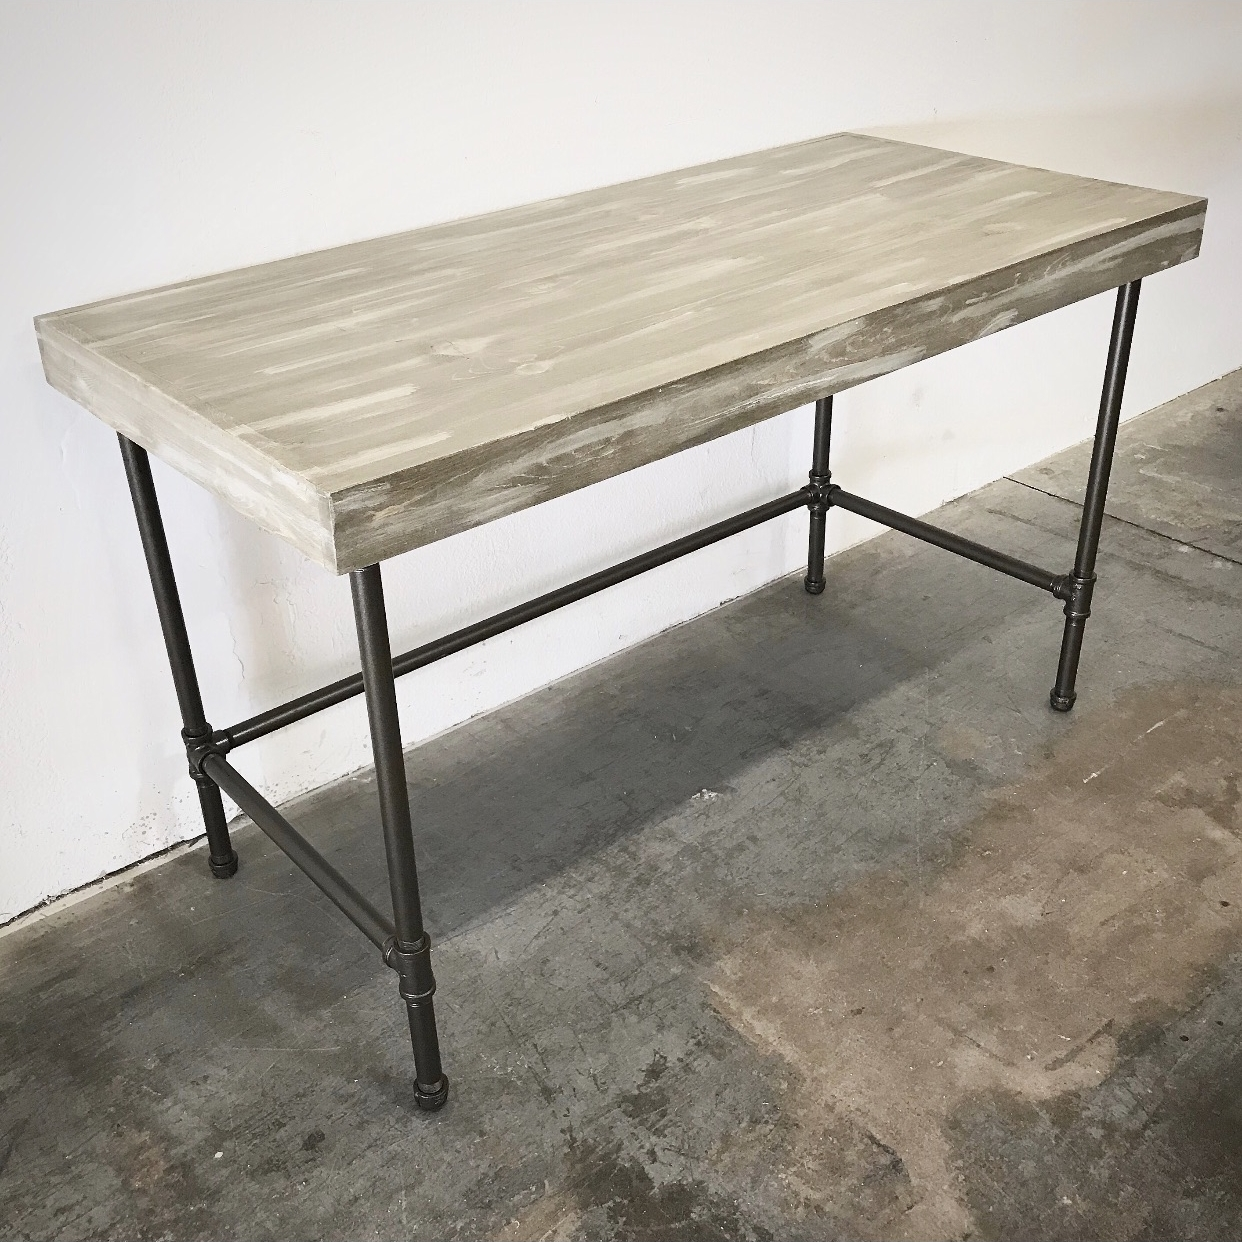 "Wayne Desk 48"" with 3"" Trim"